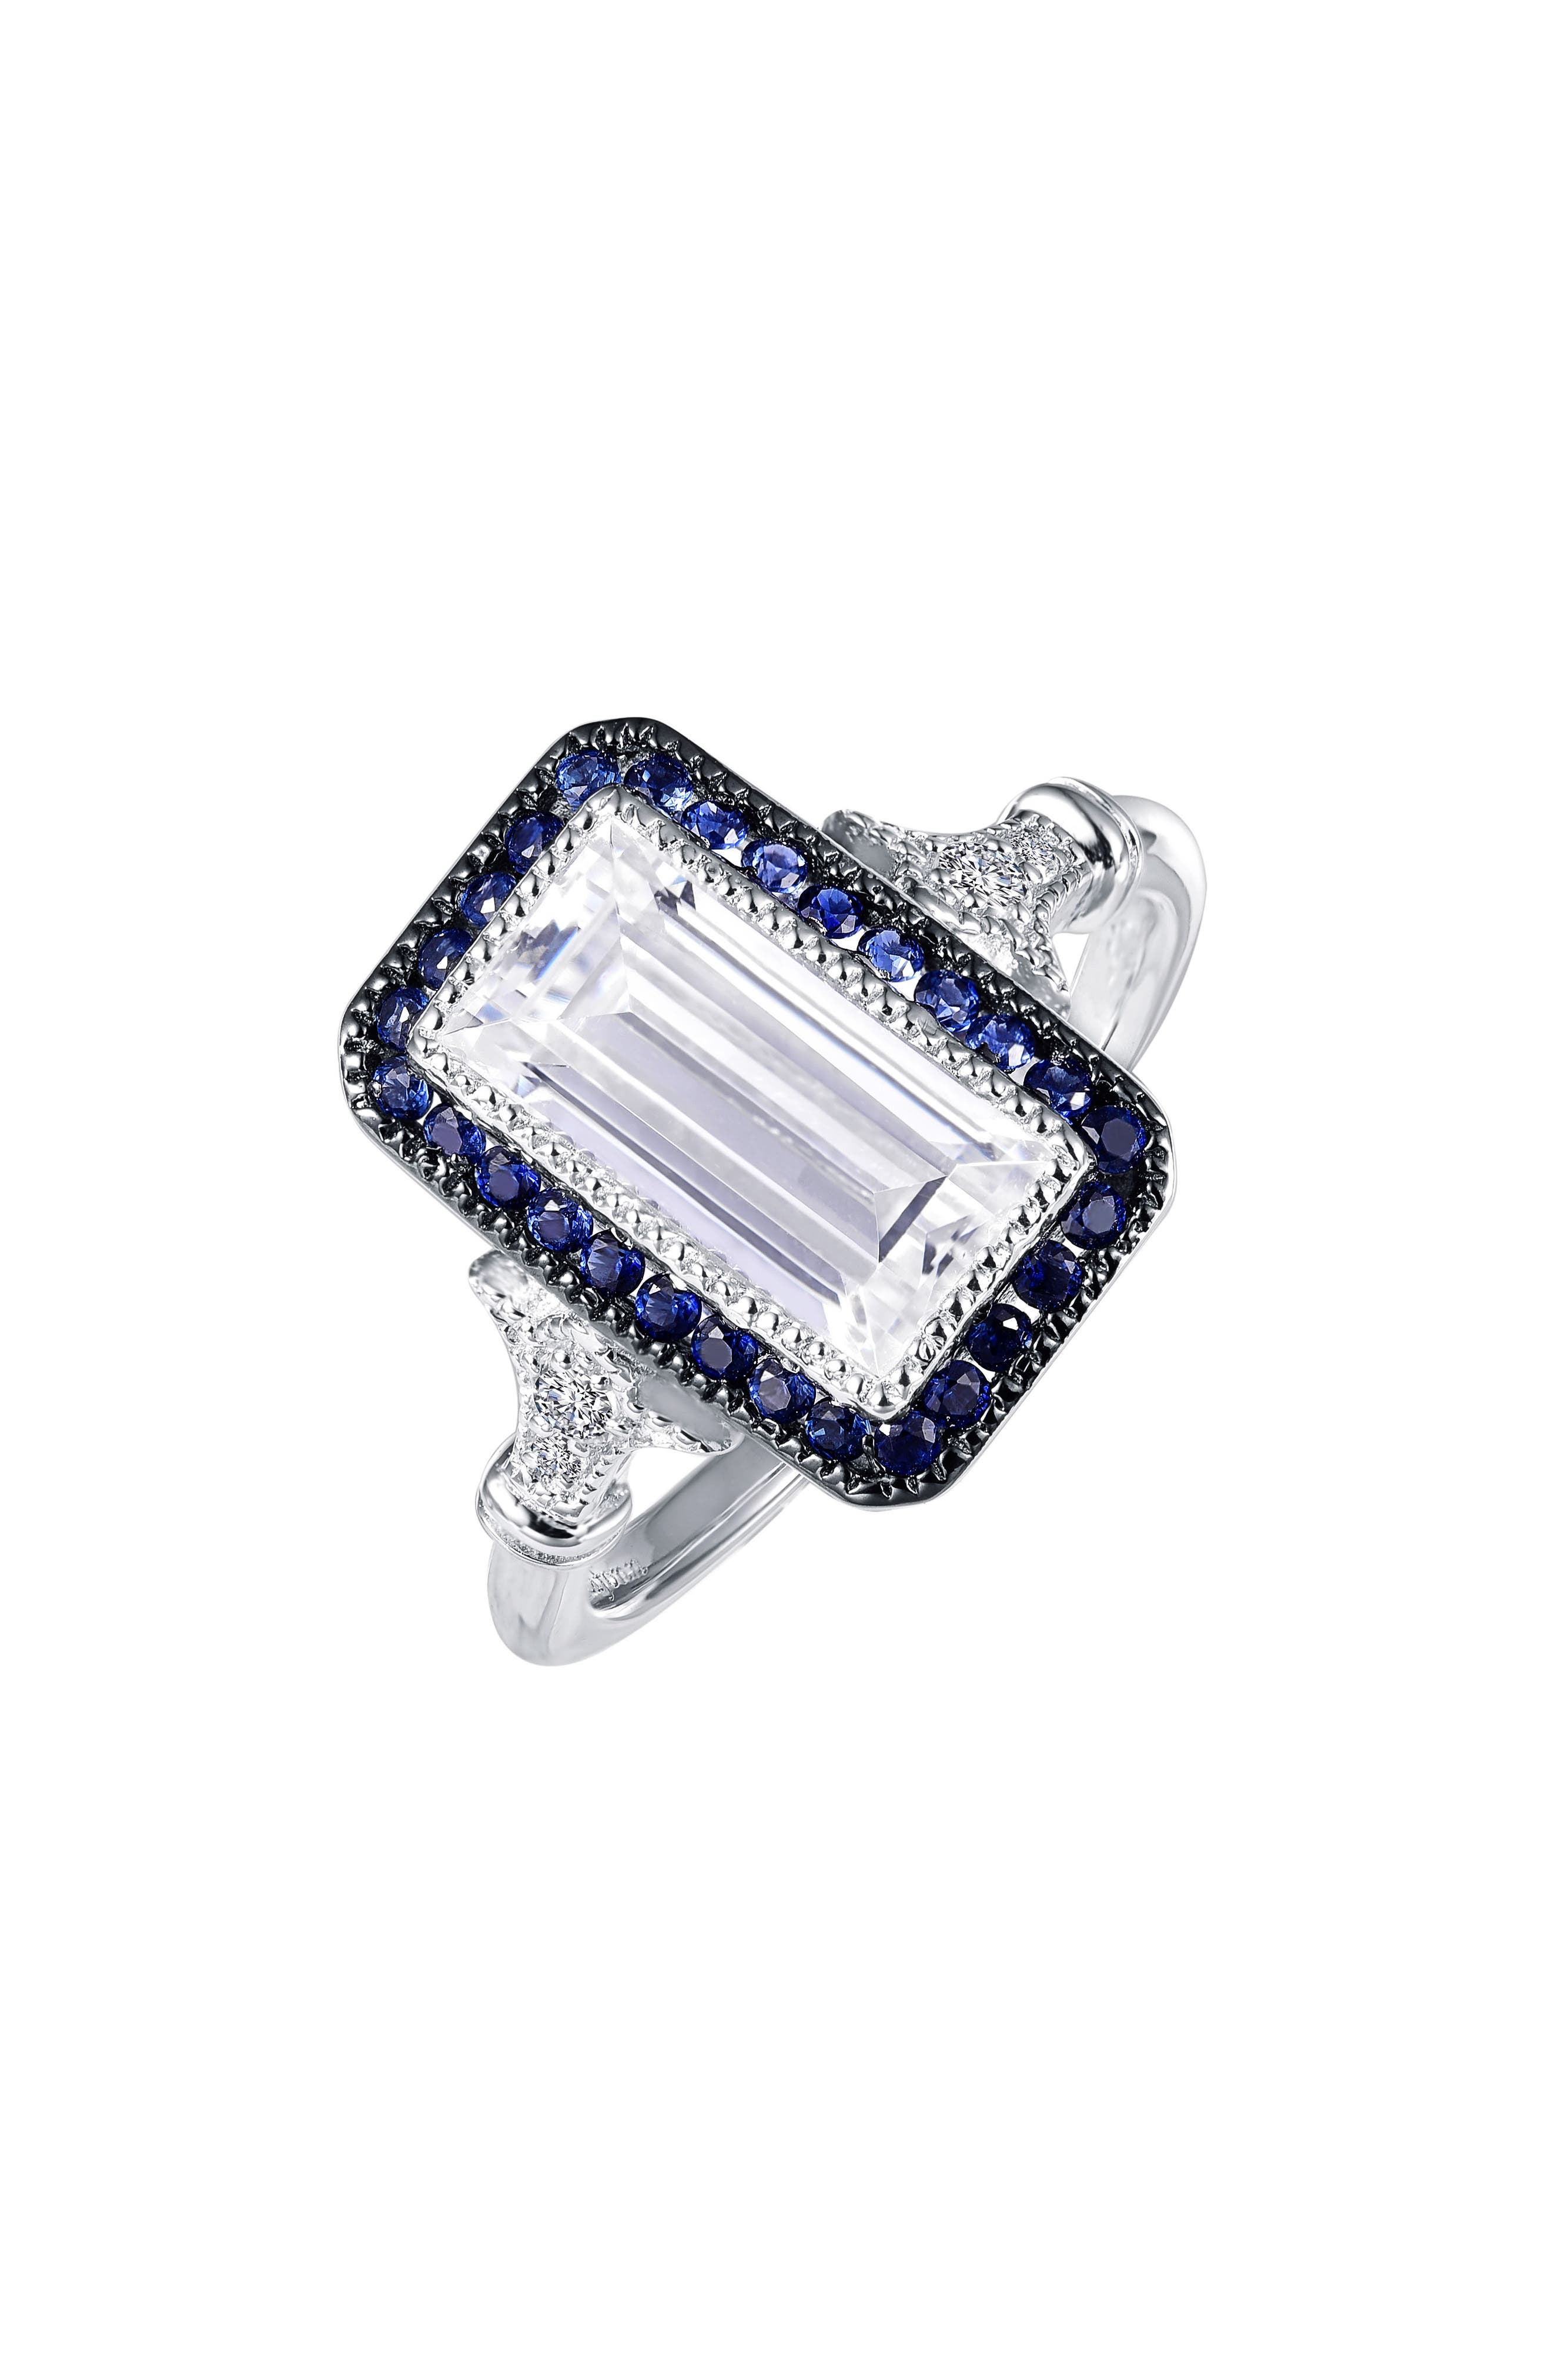 Art Deco Simulated Diamond Ring